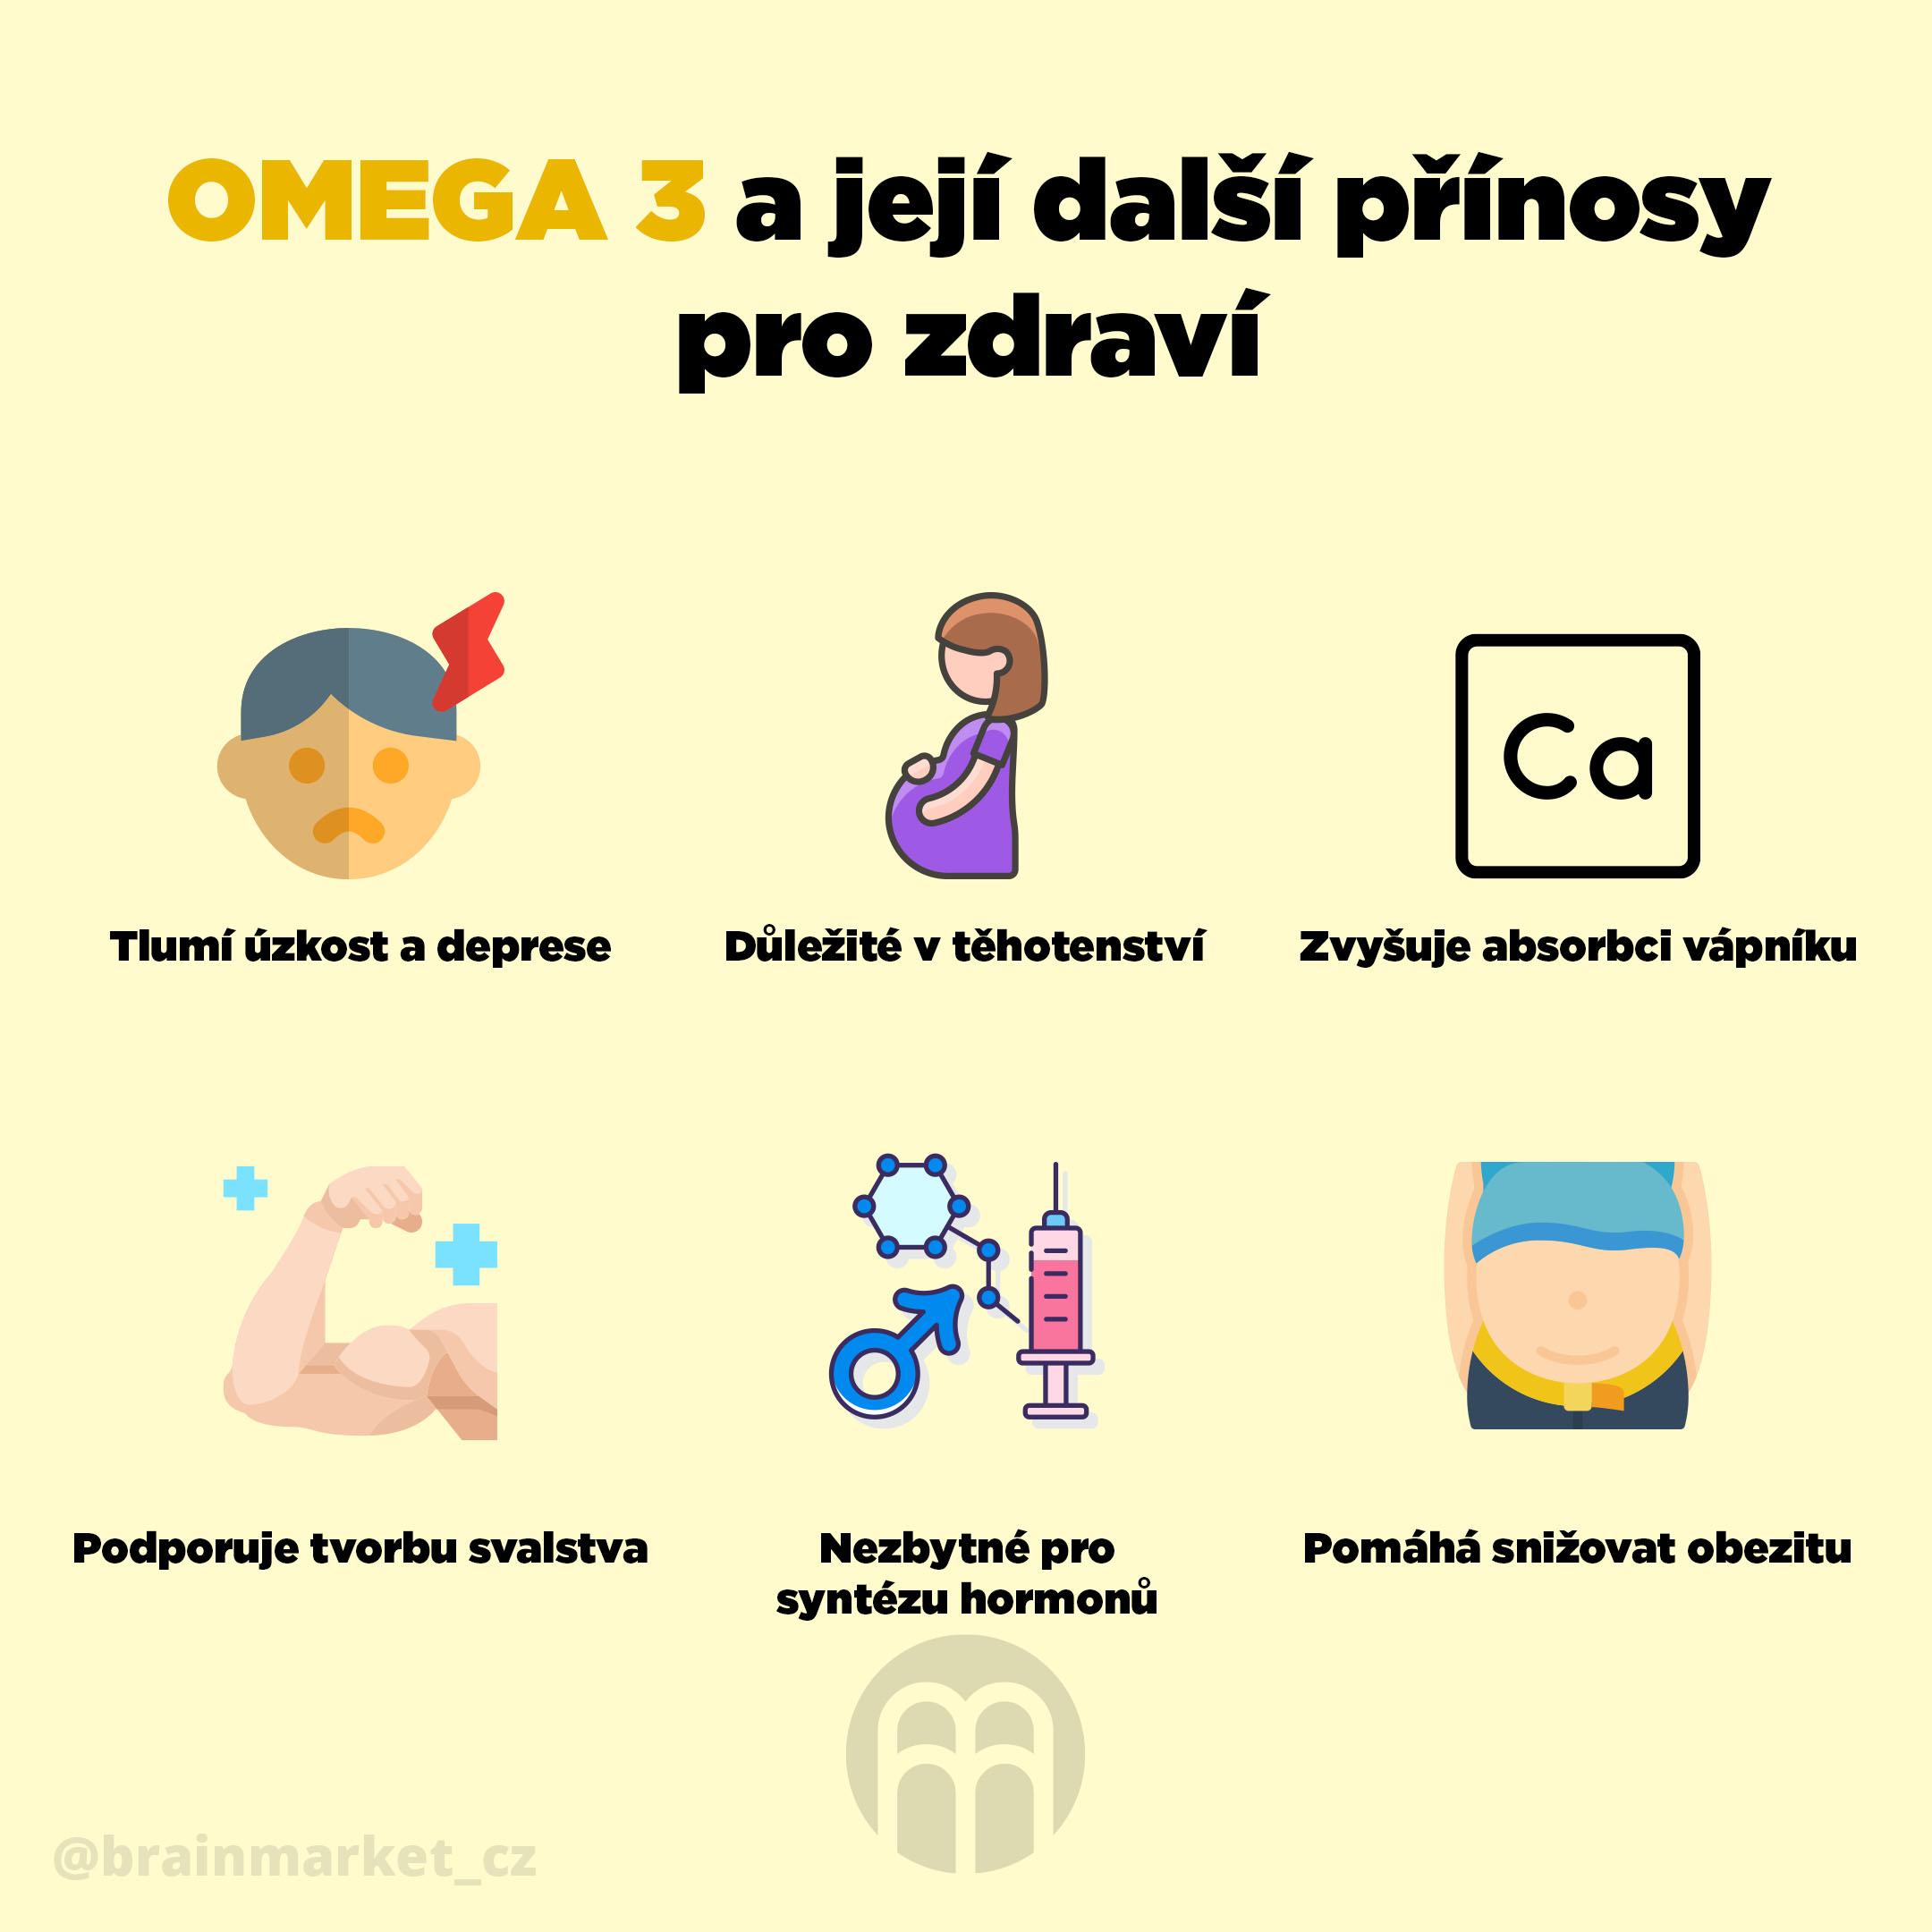 omega-3-a-jeji-dalsi-prinosy-pro-zdravi-infografika-brainmarket-cz